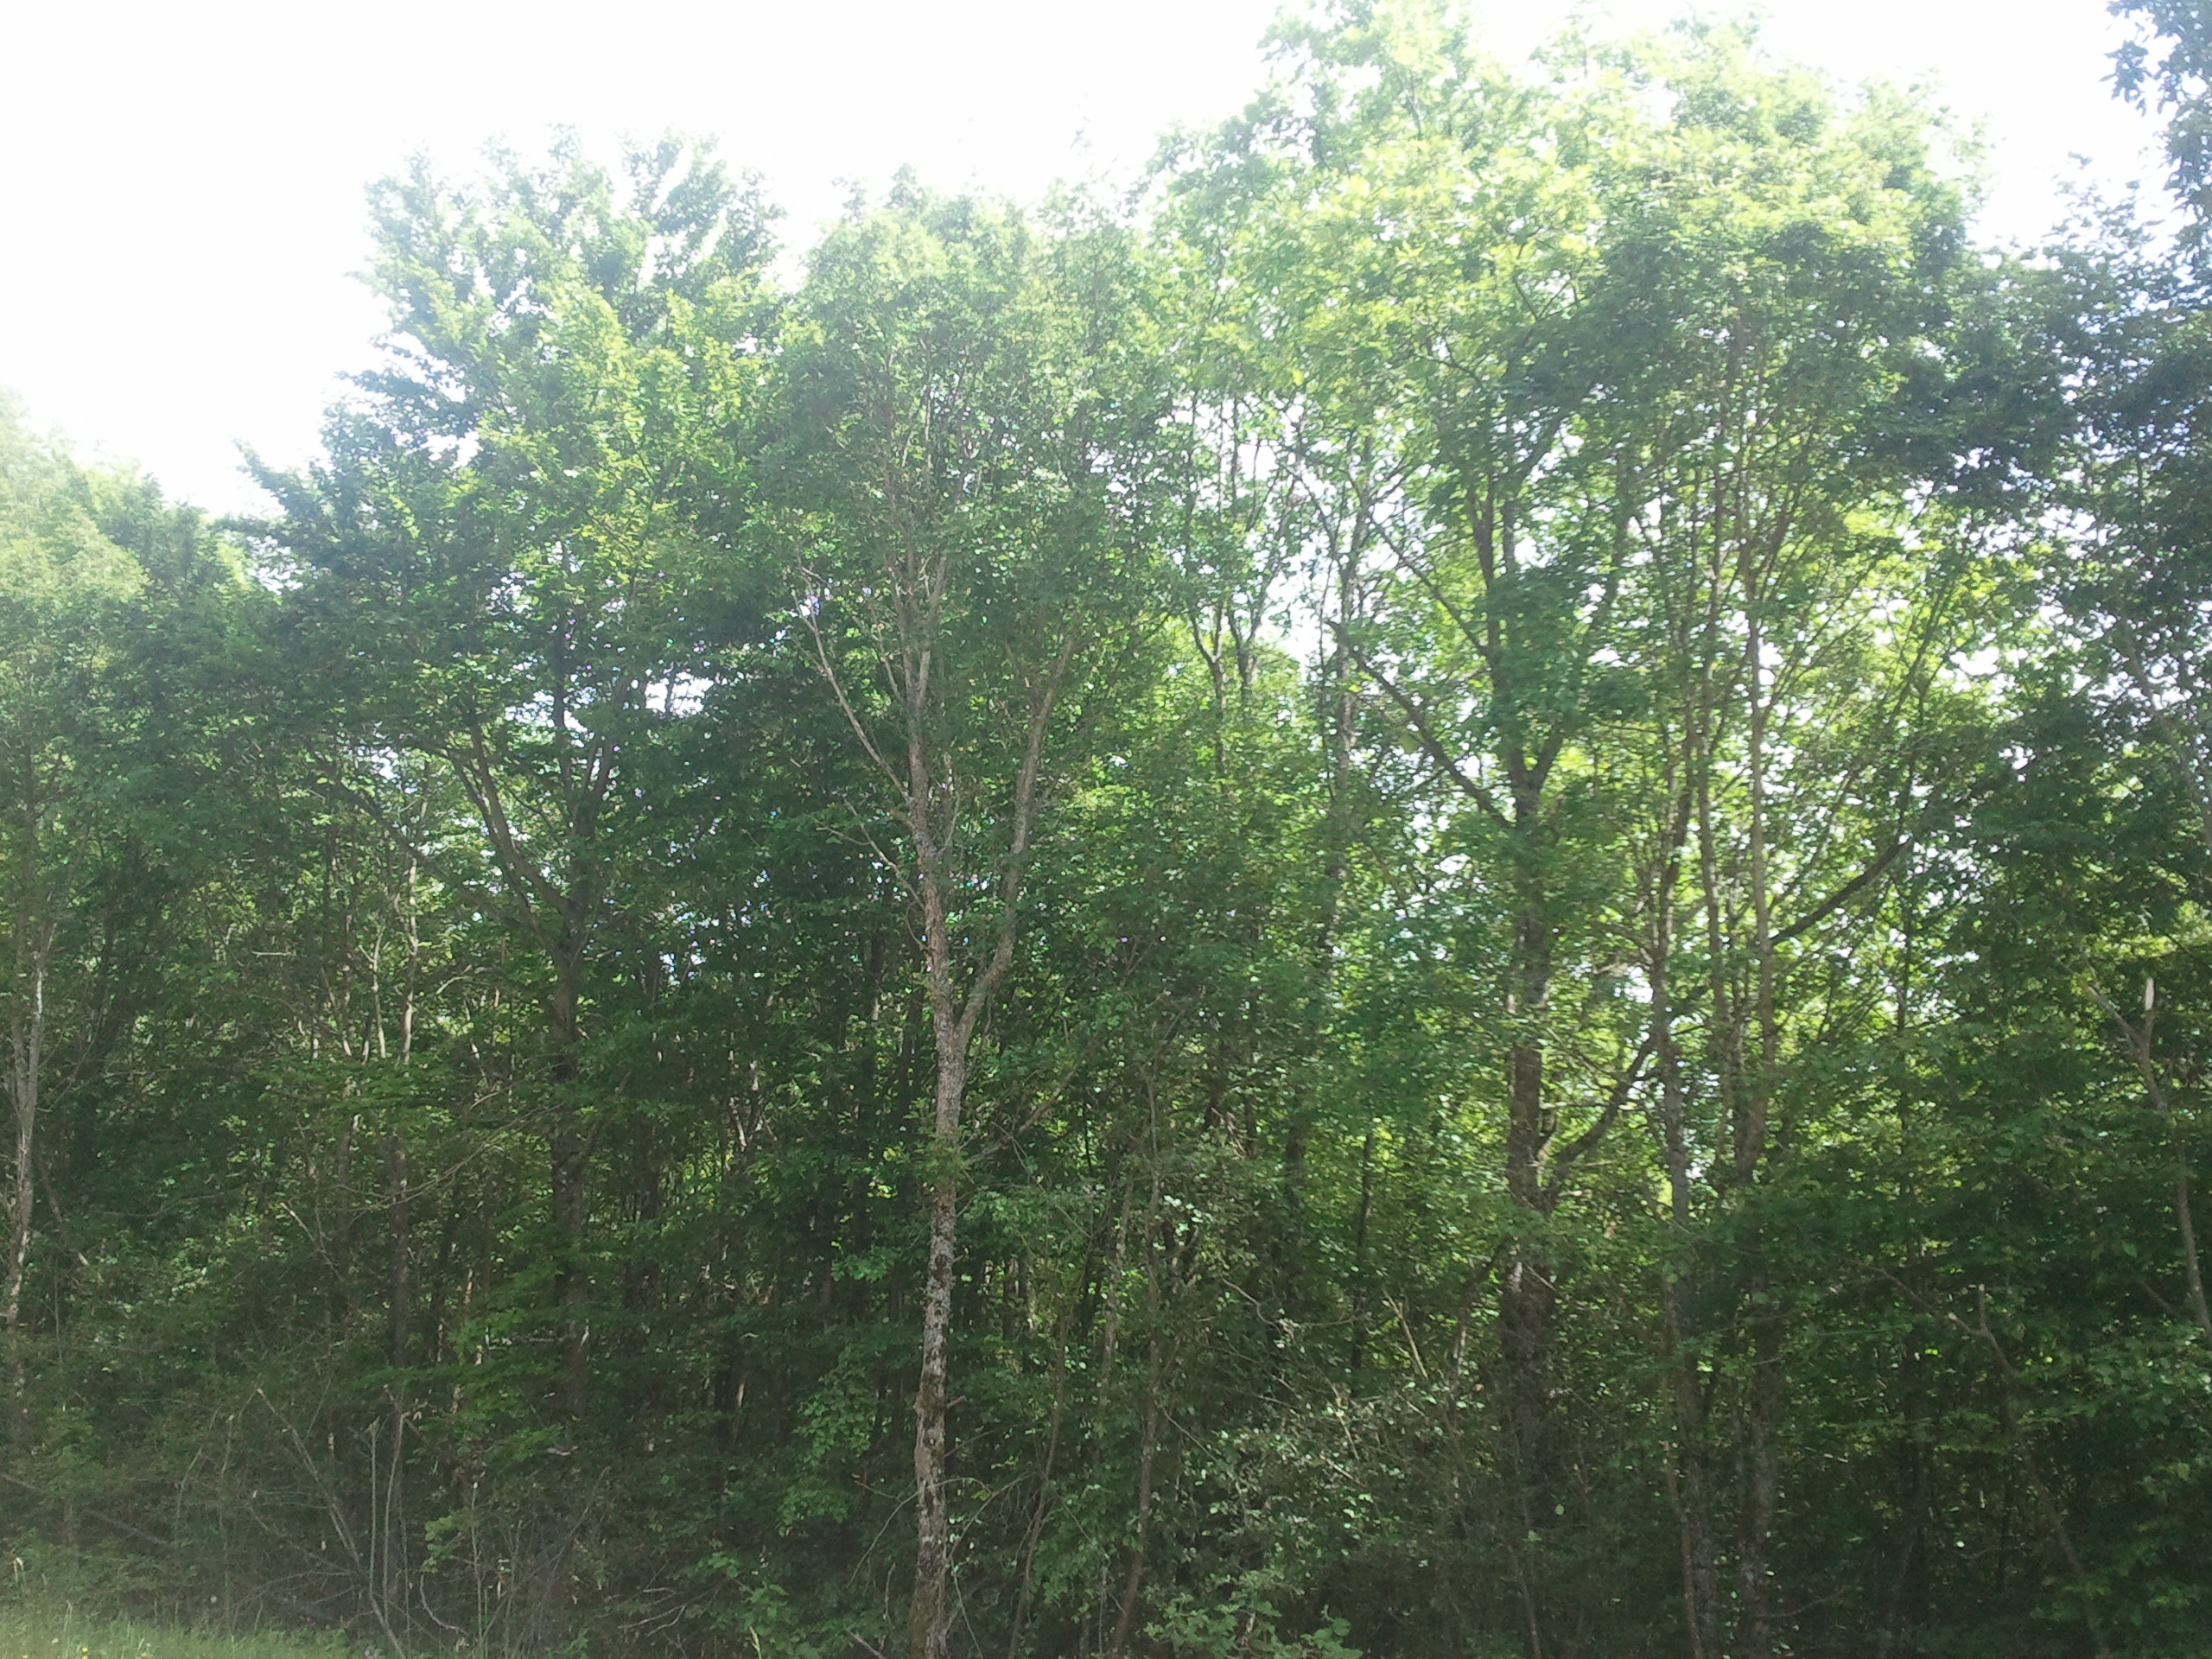 http://files.biolovision.net/www.faune-alsace.org/userfiles/Insectes/cigales/Cicadettacantilatrix-Pfaffenheim-20140521.jpg